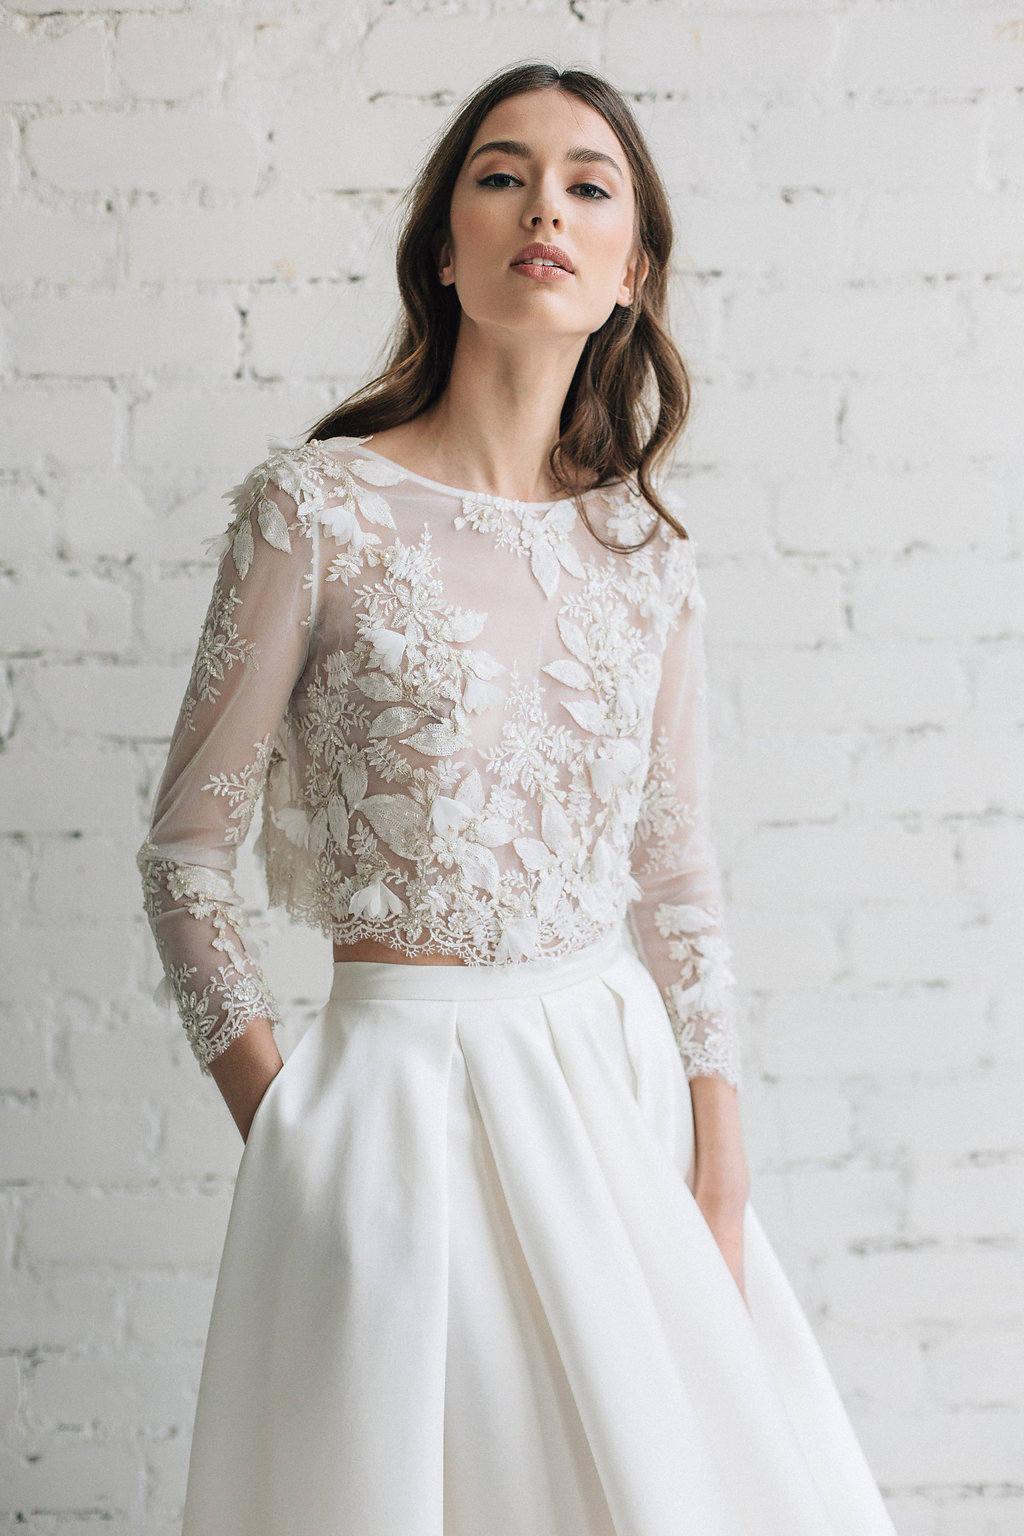 Lace Wedding Top Bridal Separates Bridal Lace Top 3D